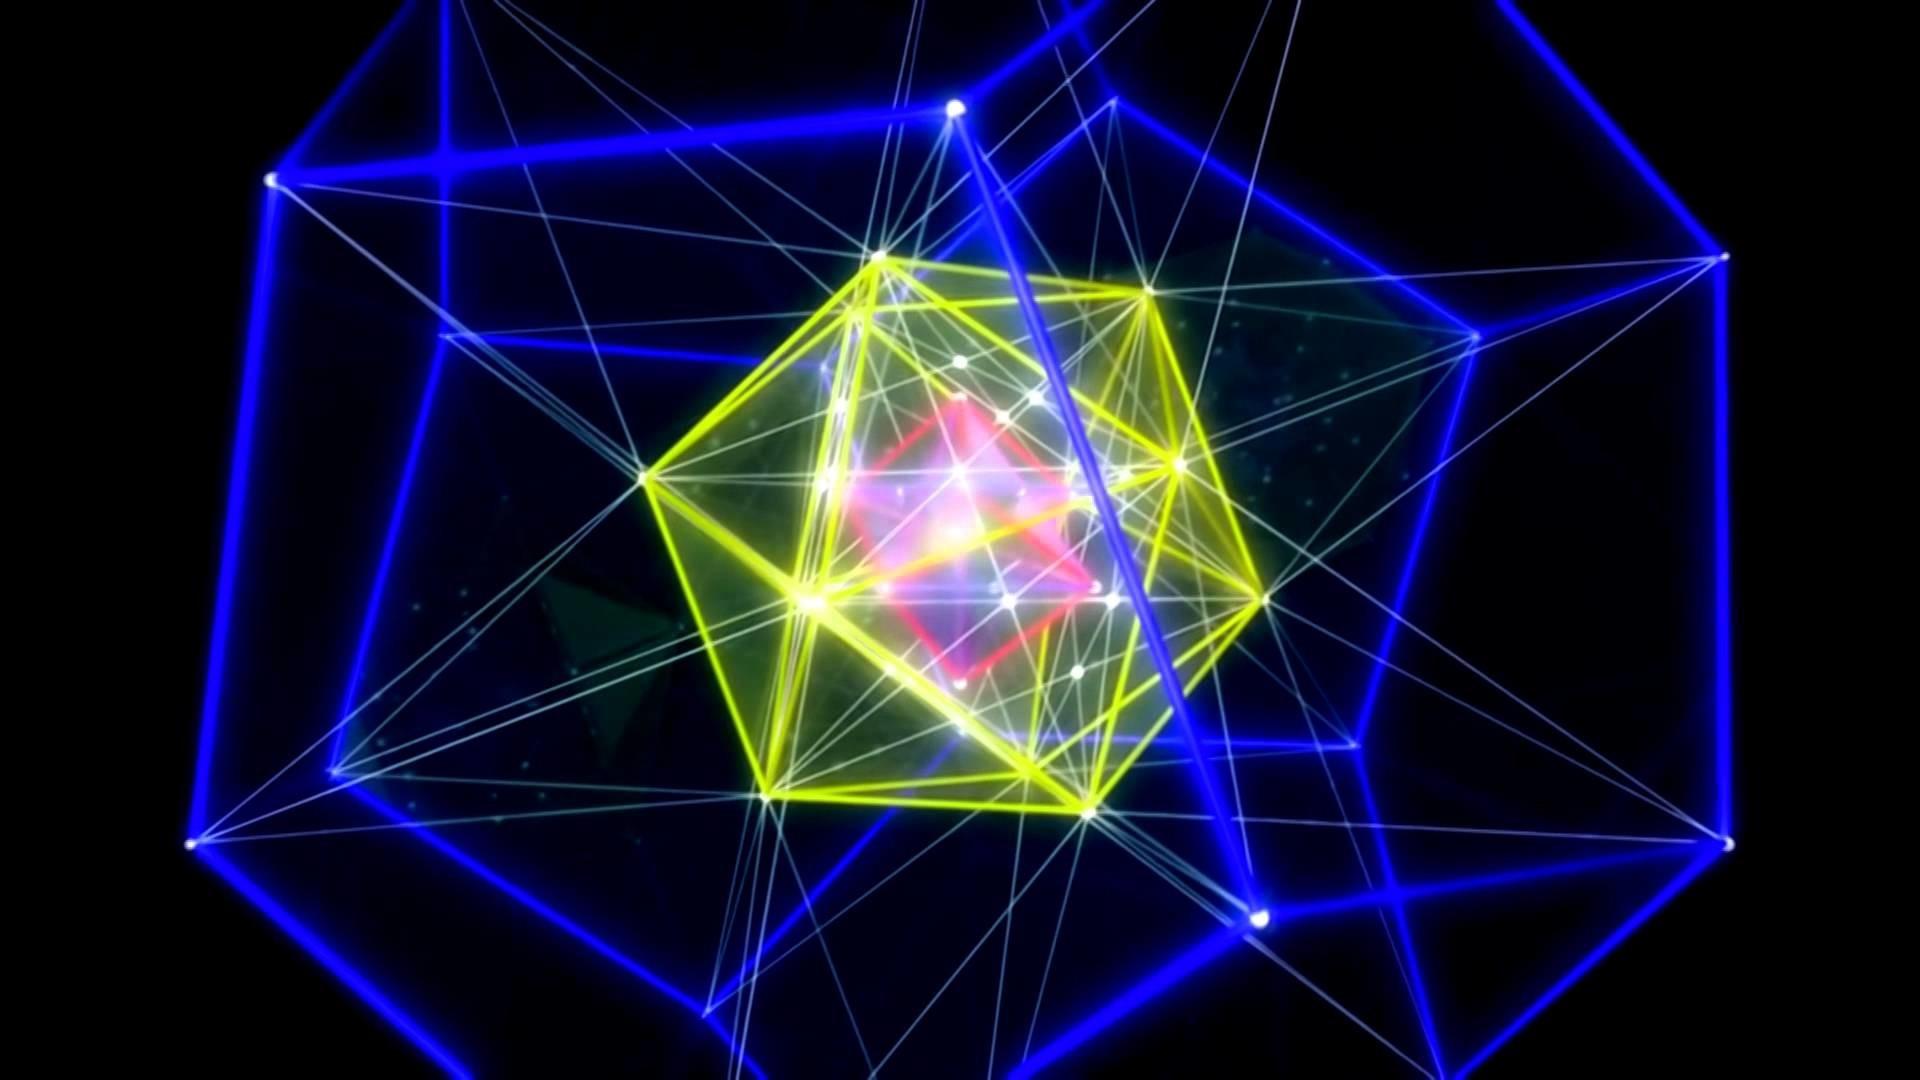 3d Asteroid Wallpaper Metatrons Cube Wallpaper 48 Images